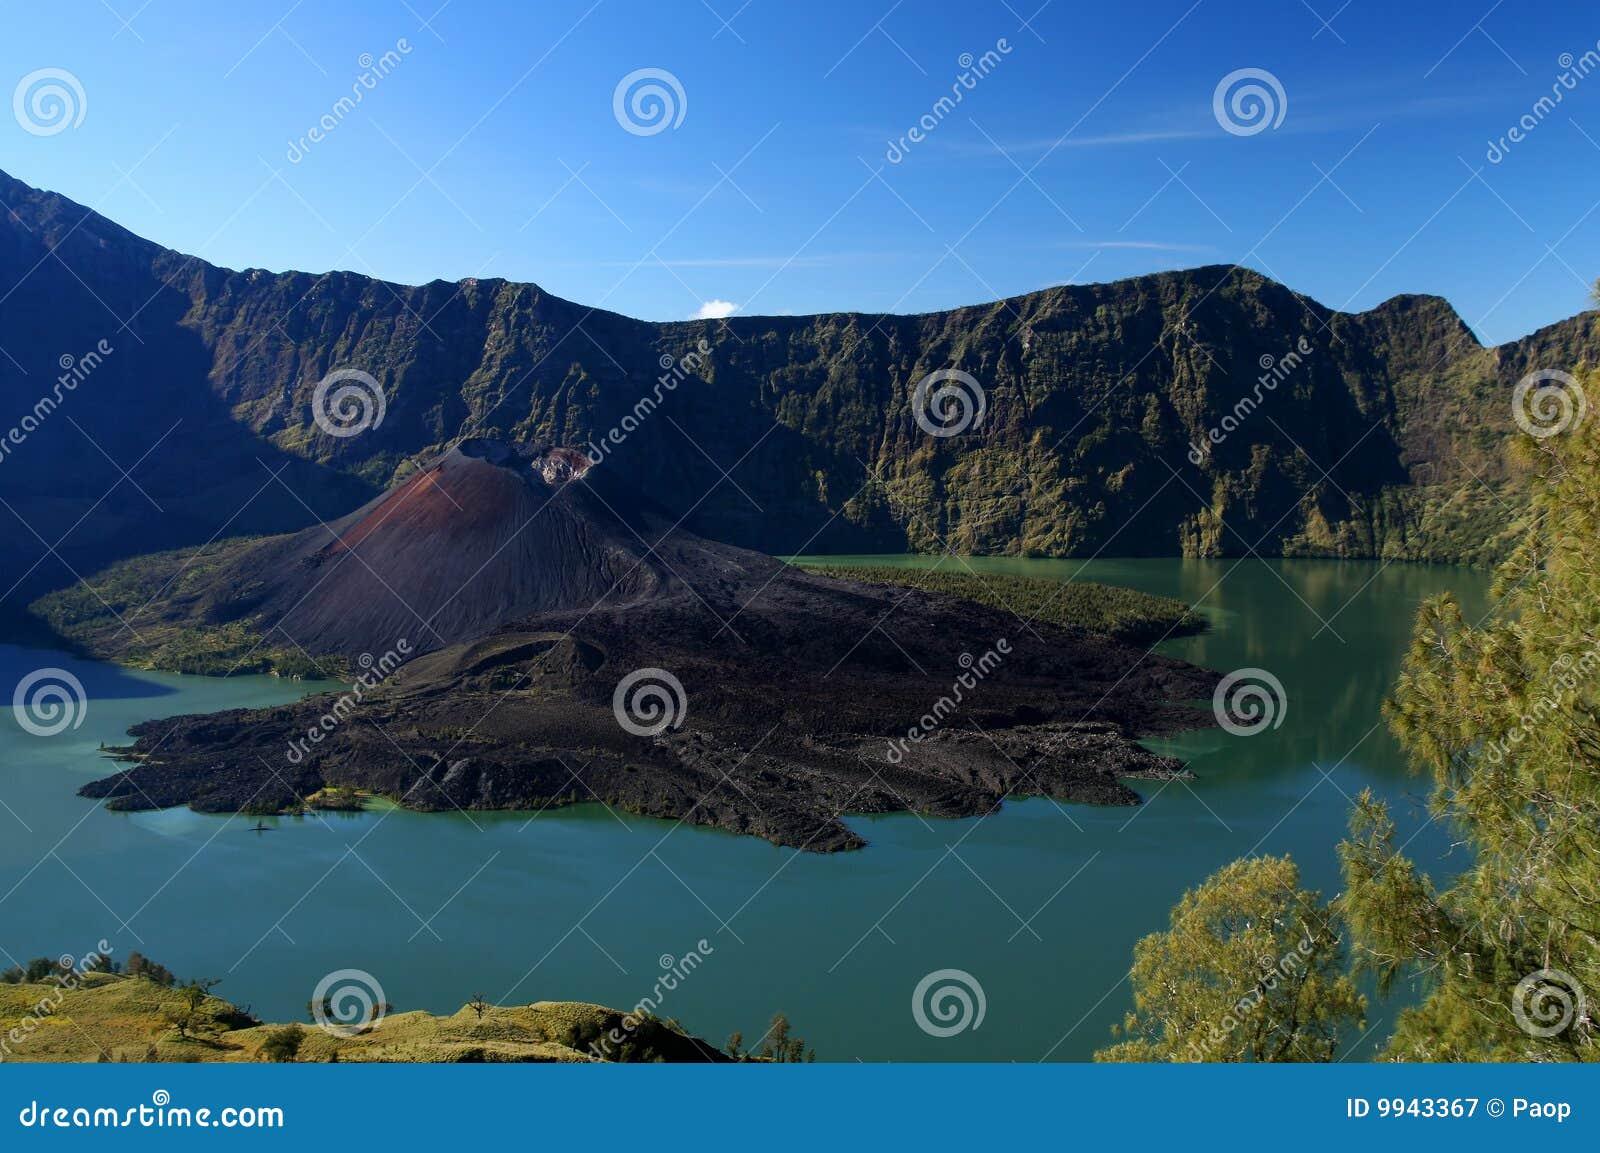 Castellammare del golfo sicily italy stock photo image 48782909 - Gunung Rinjani Royalty Free Stock Photography